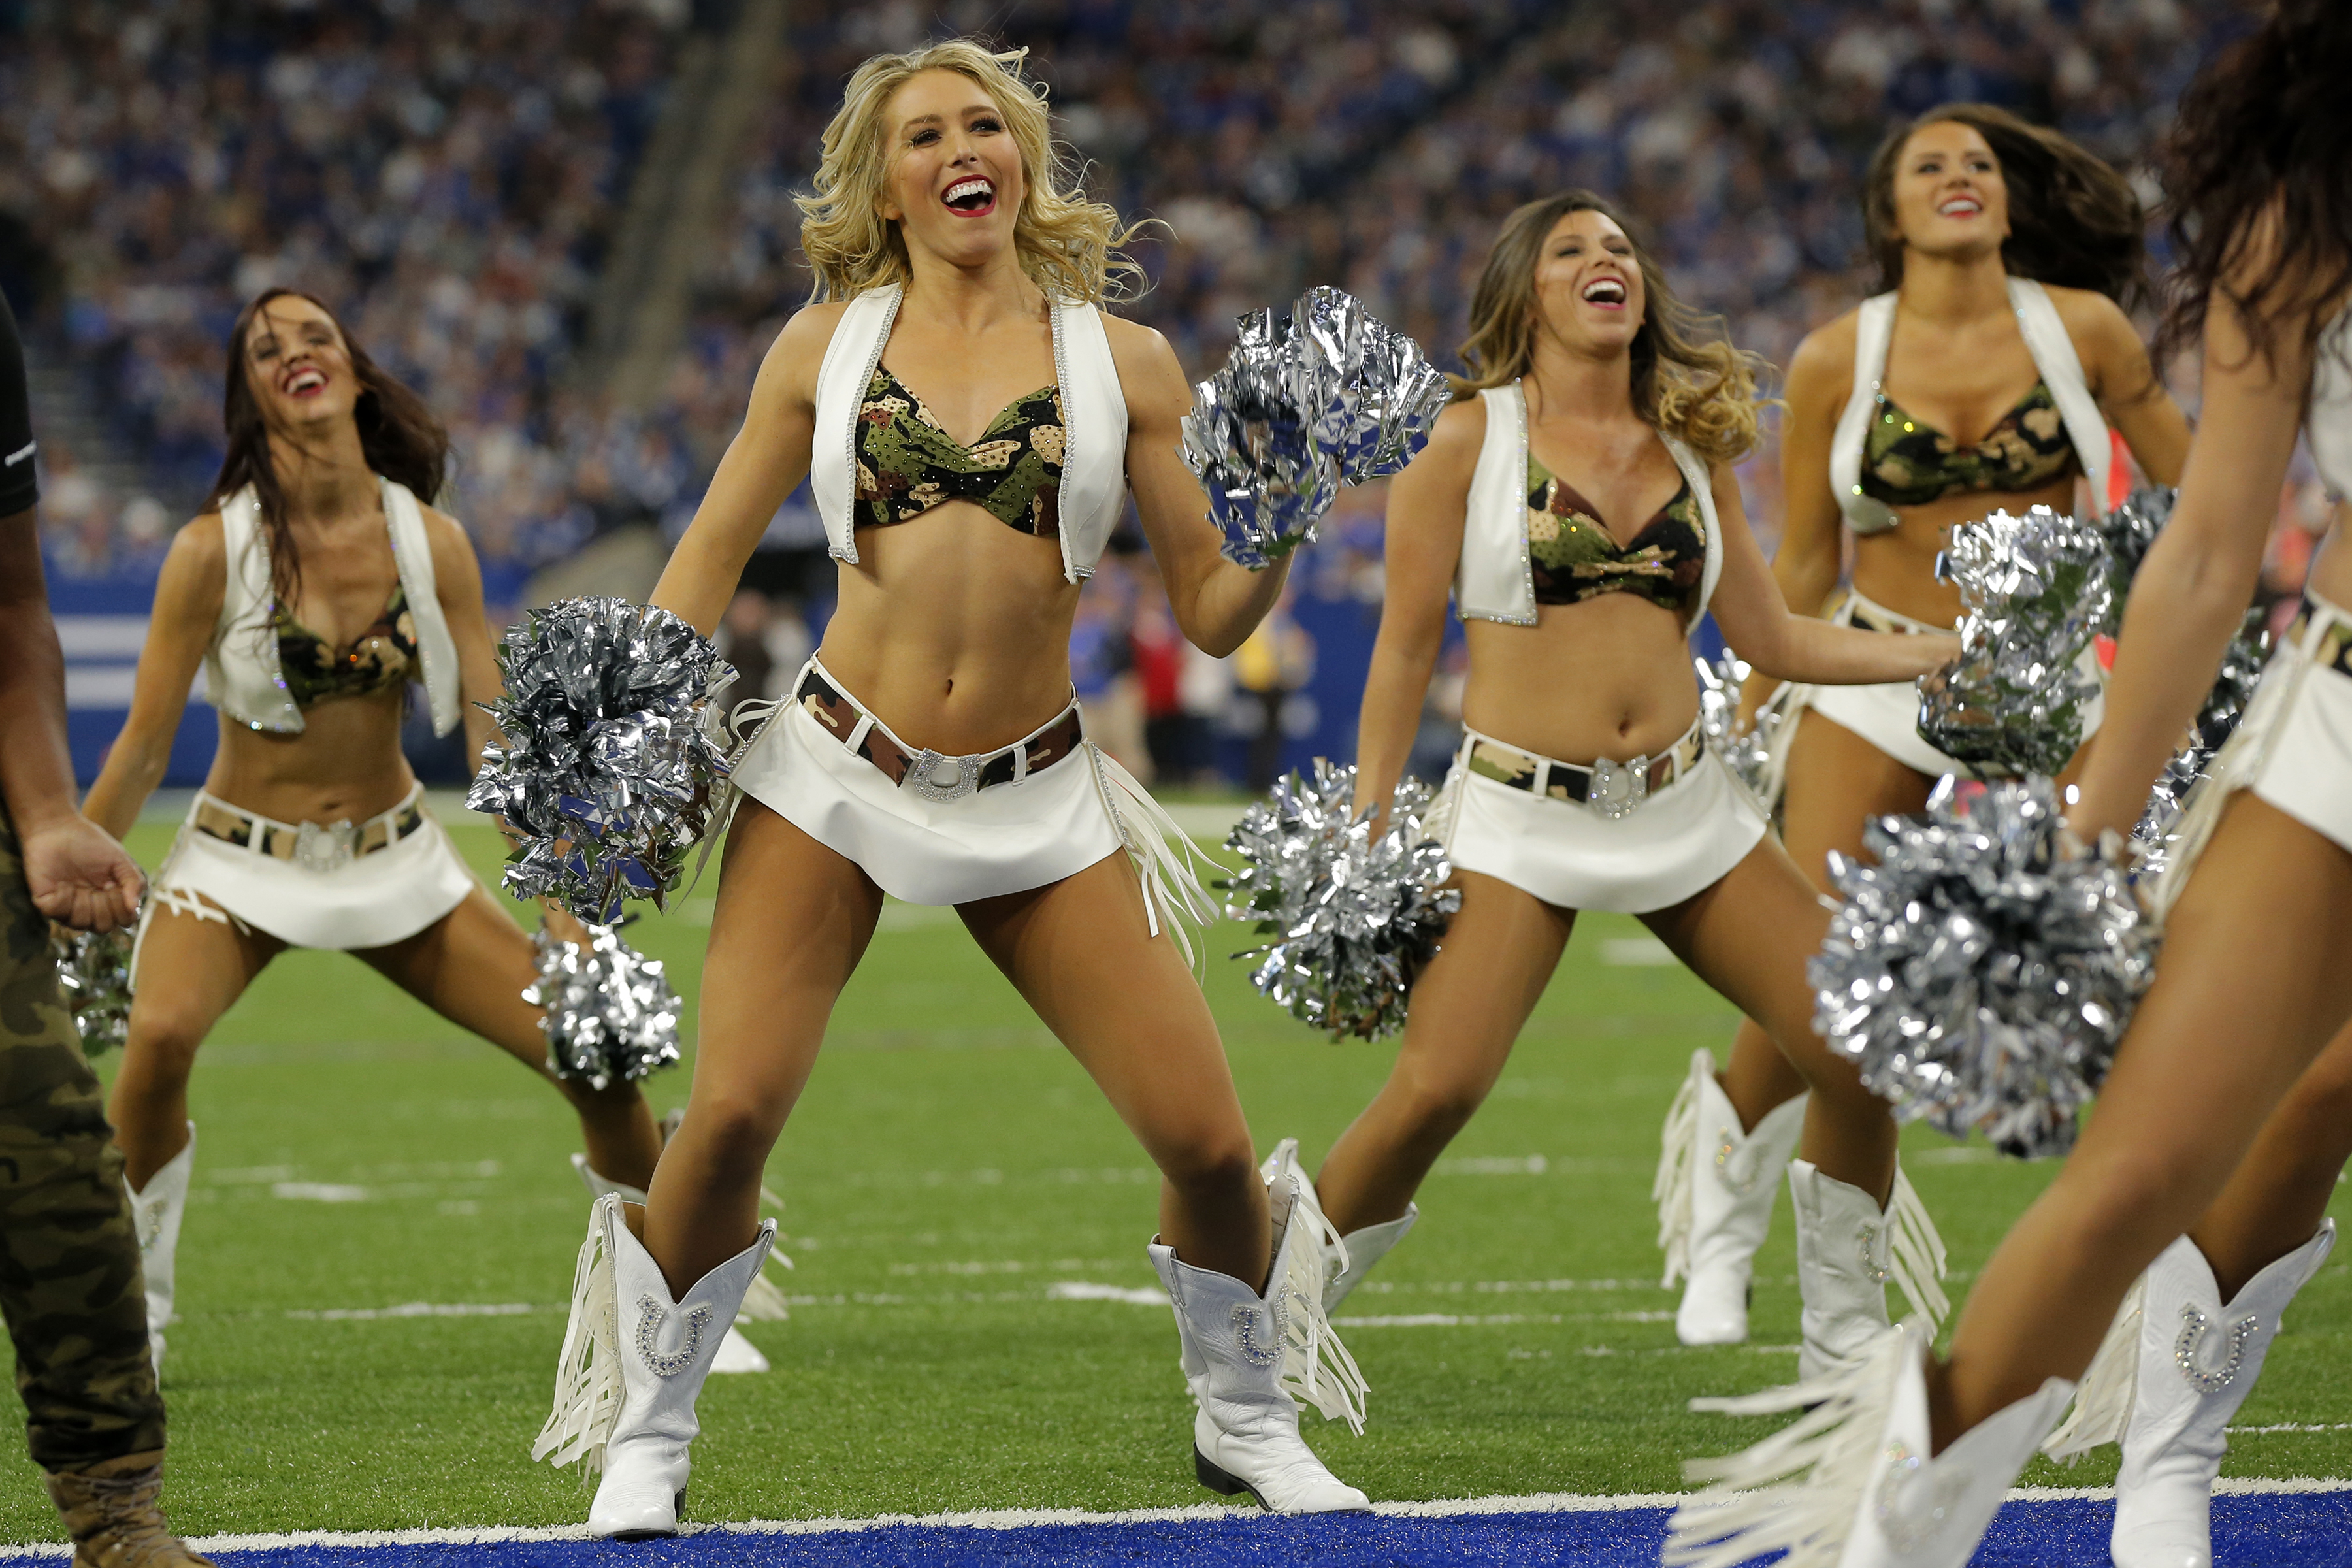 NFL: NOV 11 Jaguars at Colts